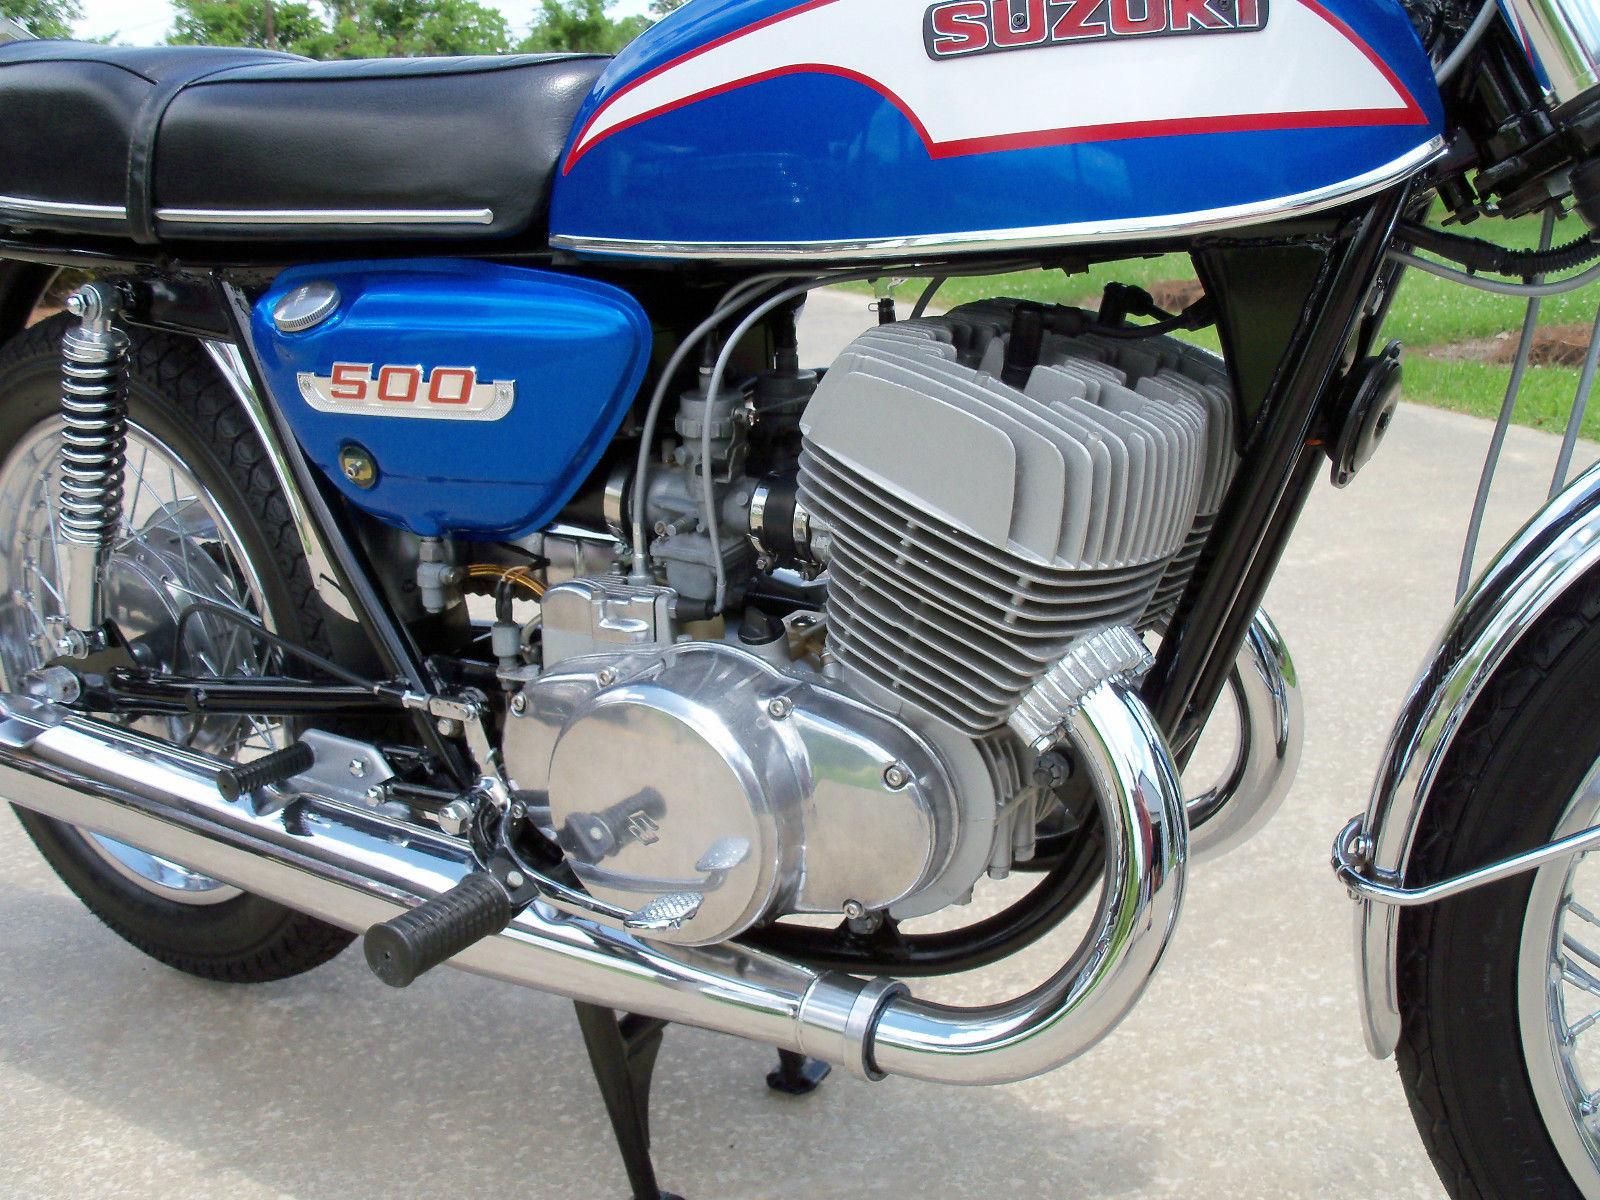 Restored Suzuki T500 1973 Photographs At Classic Bikes